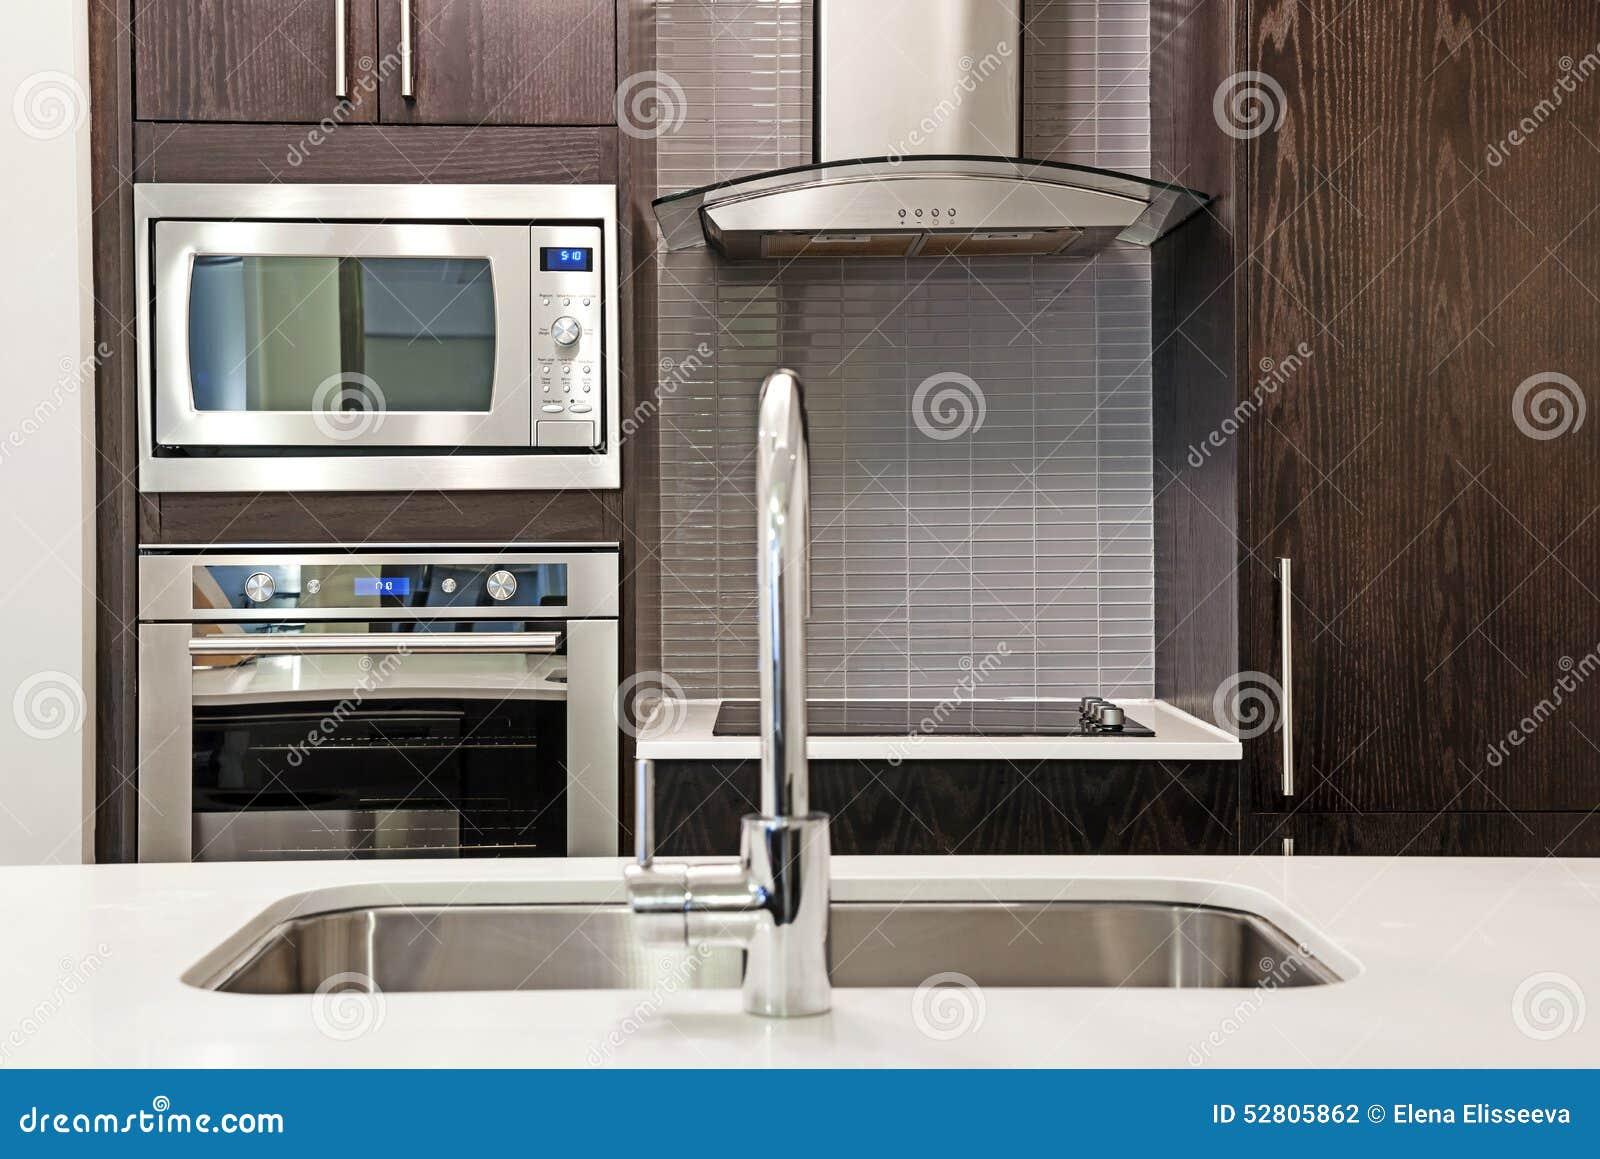 Modern kitchen interior stock photo image 52805862 - Modern luxury kitchen with granite countertop ...